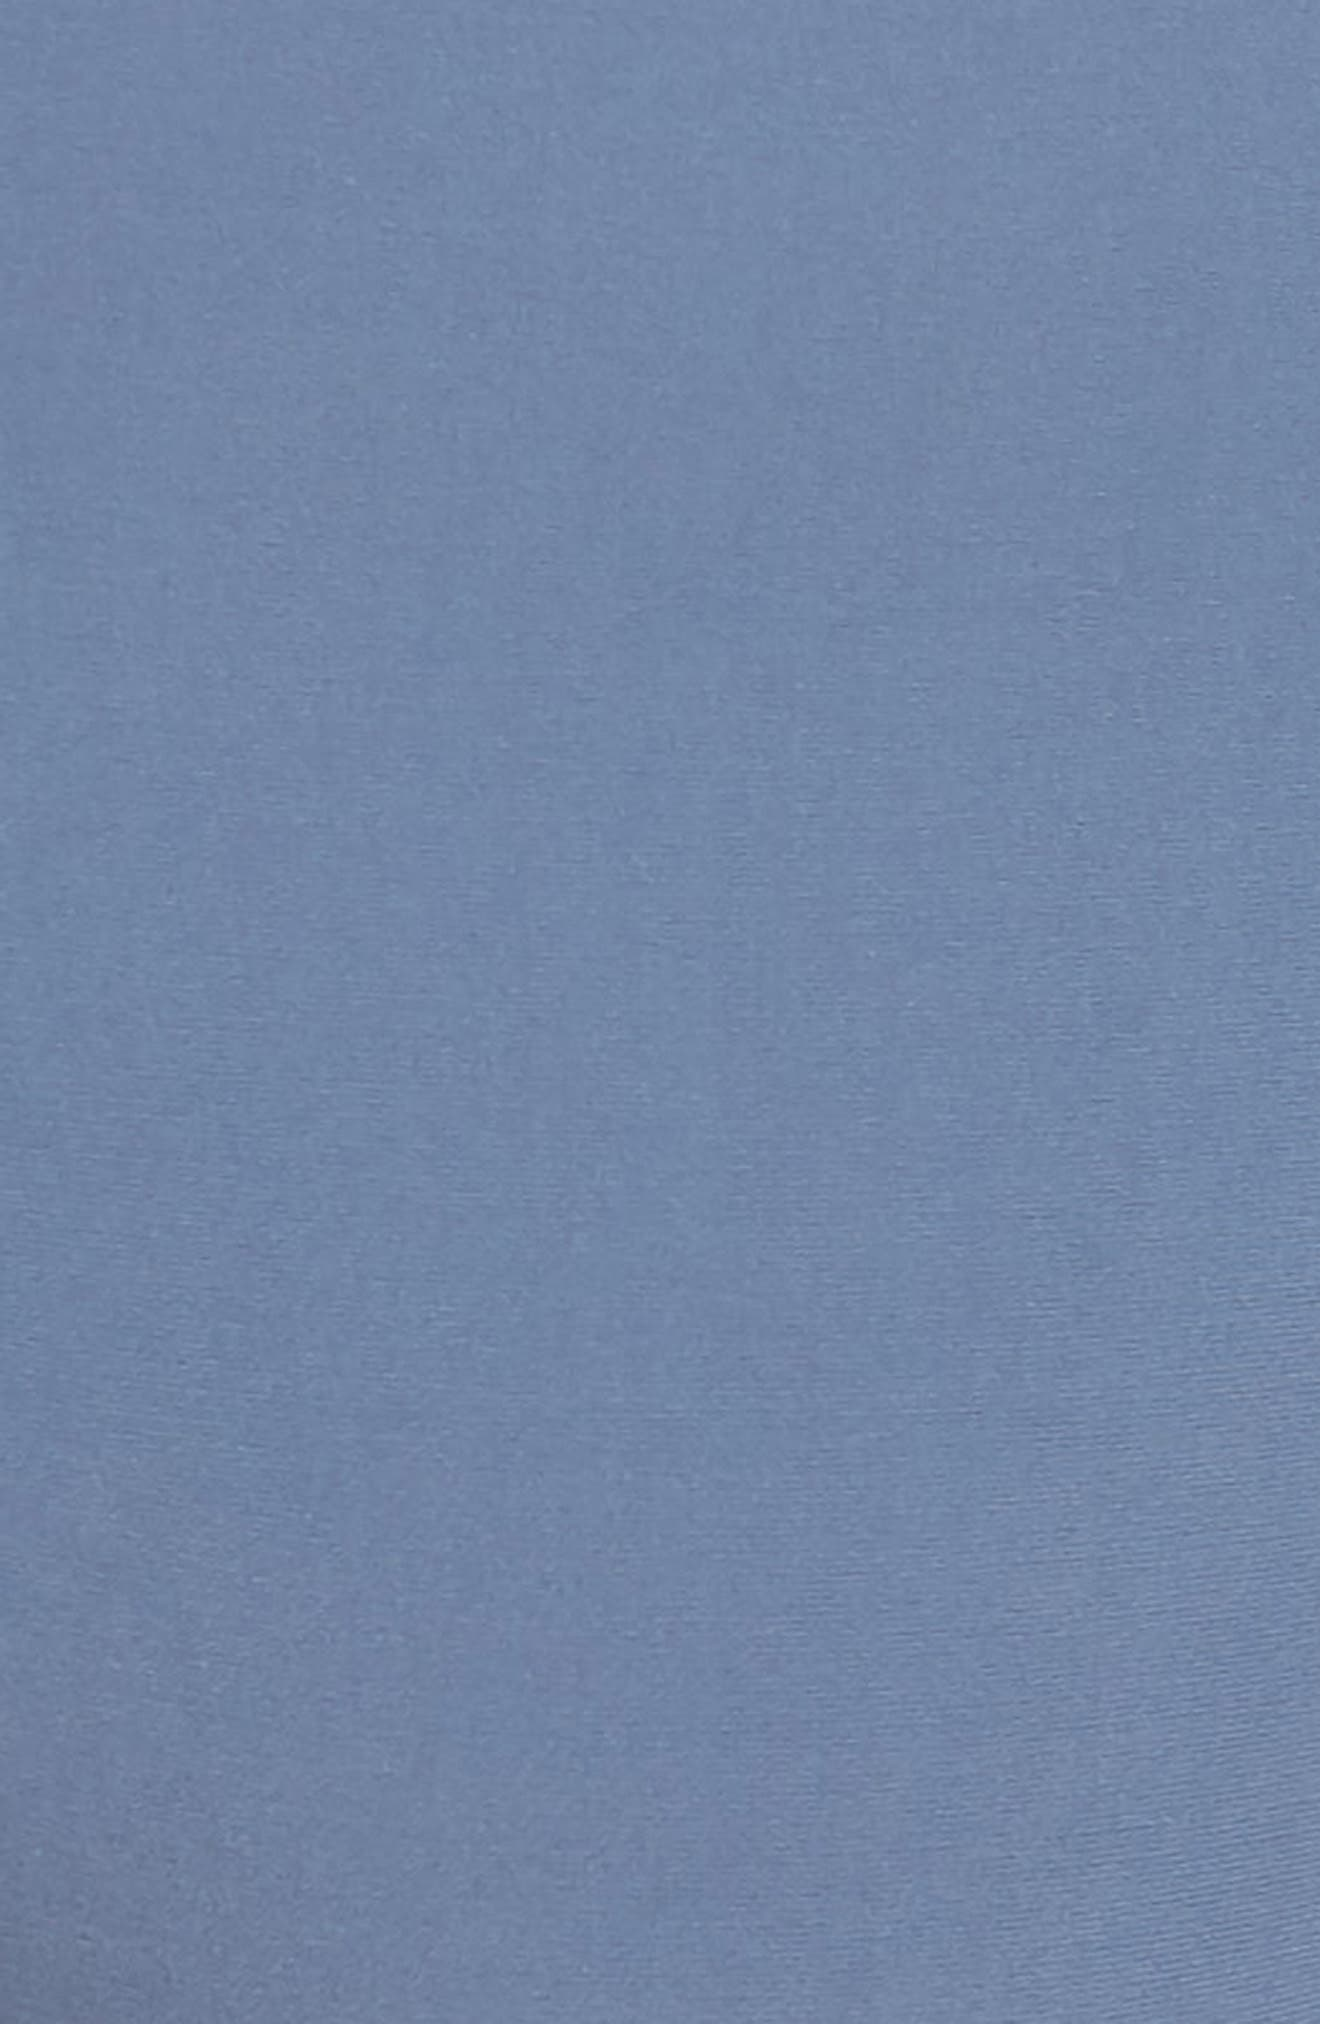 ZERO Feel Tanga,                             Alternate thumbnail 5, color,                             CLOUDY BLUE